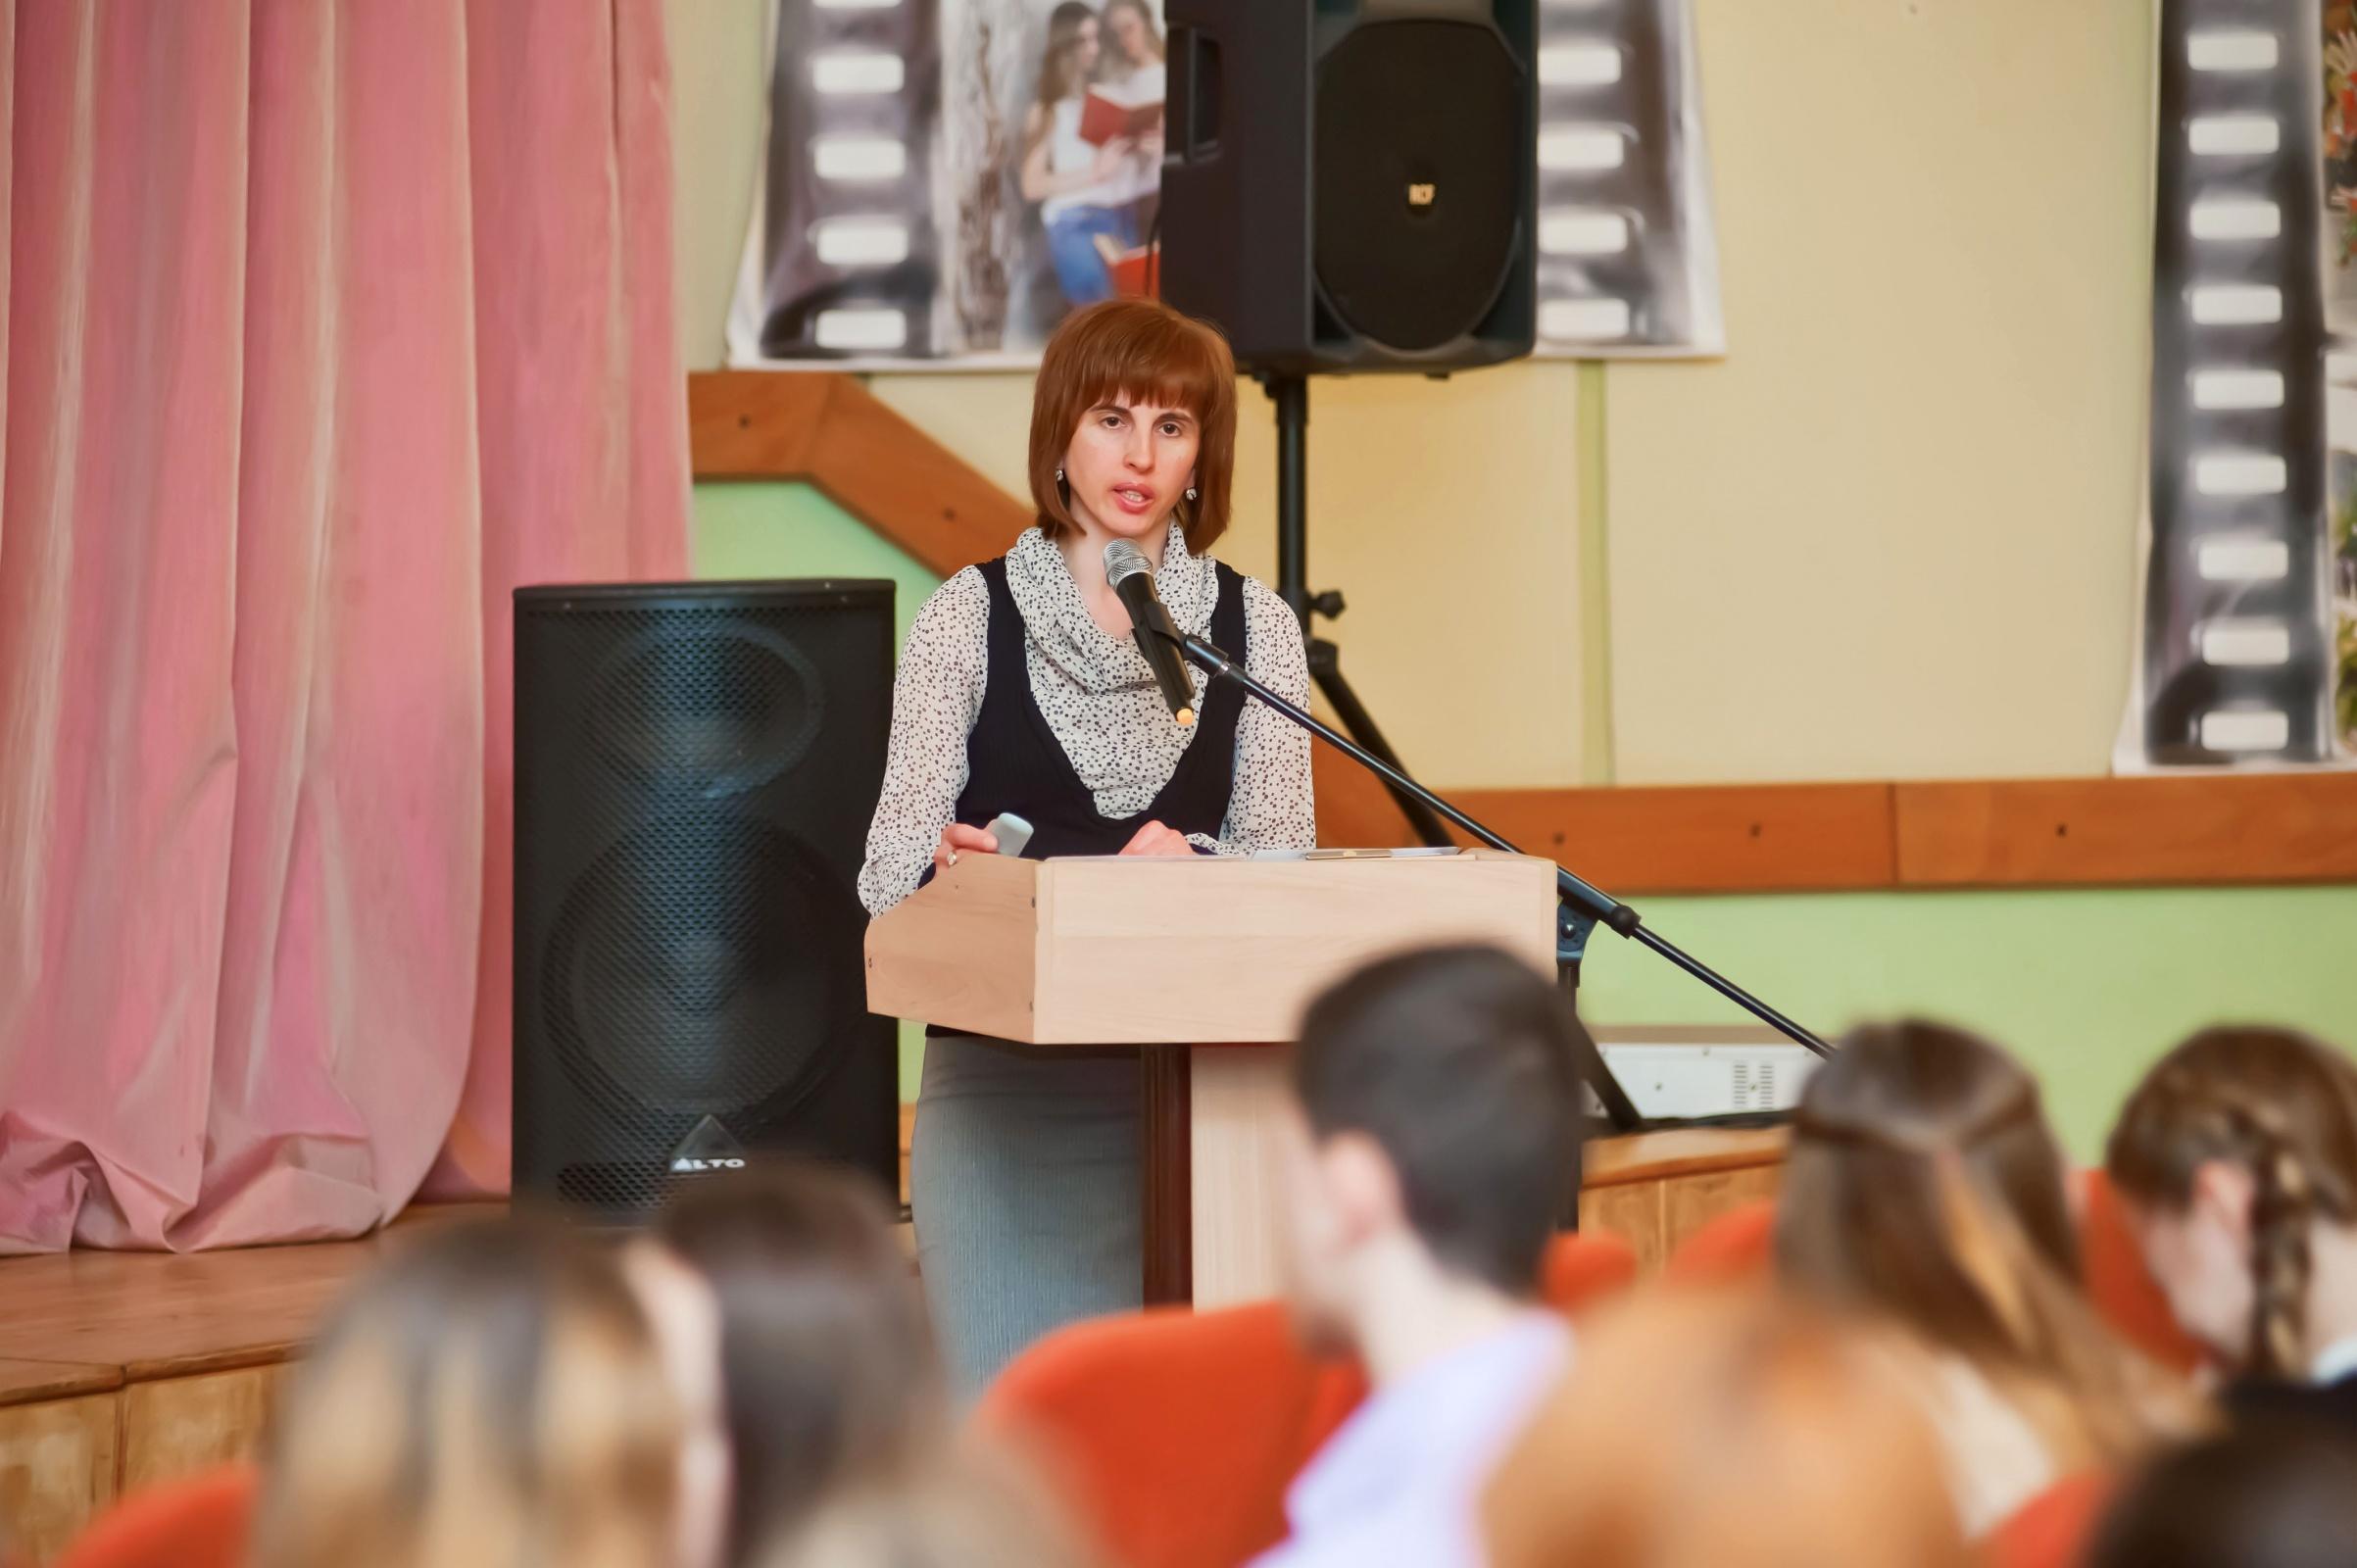 анна толмацкая как познакомились